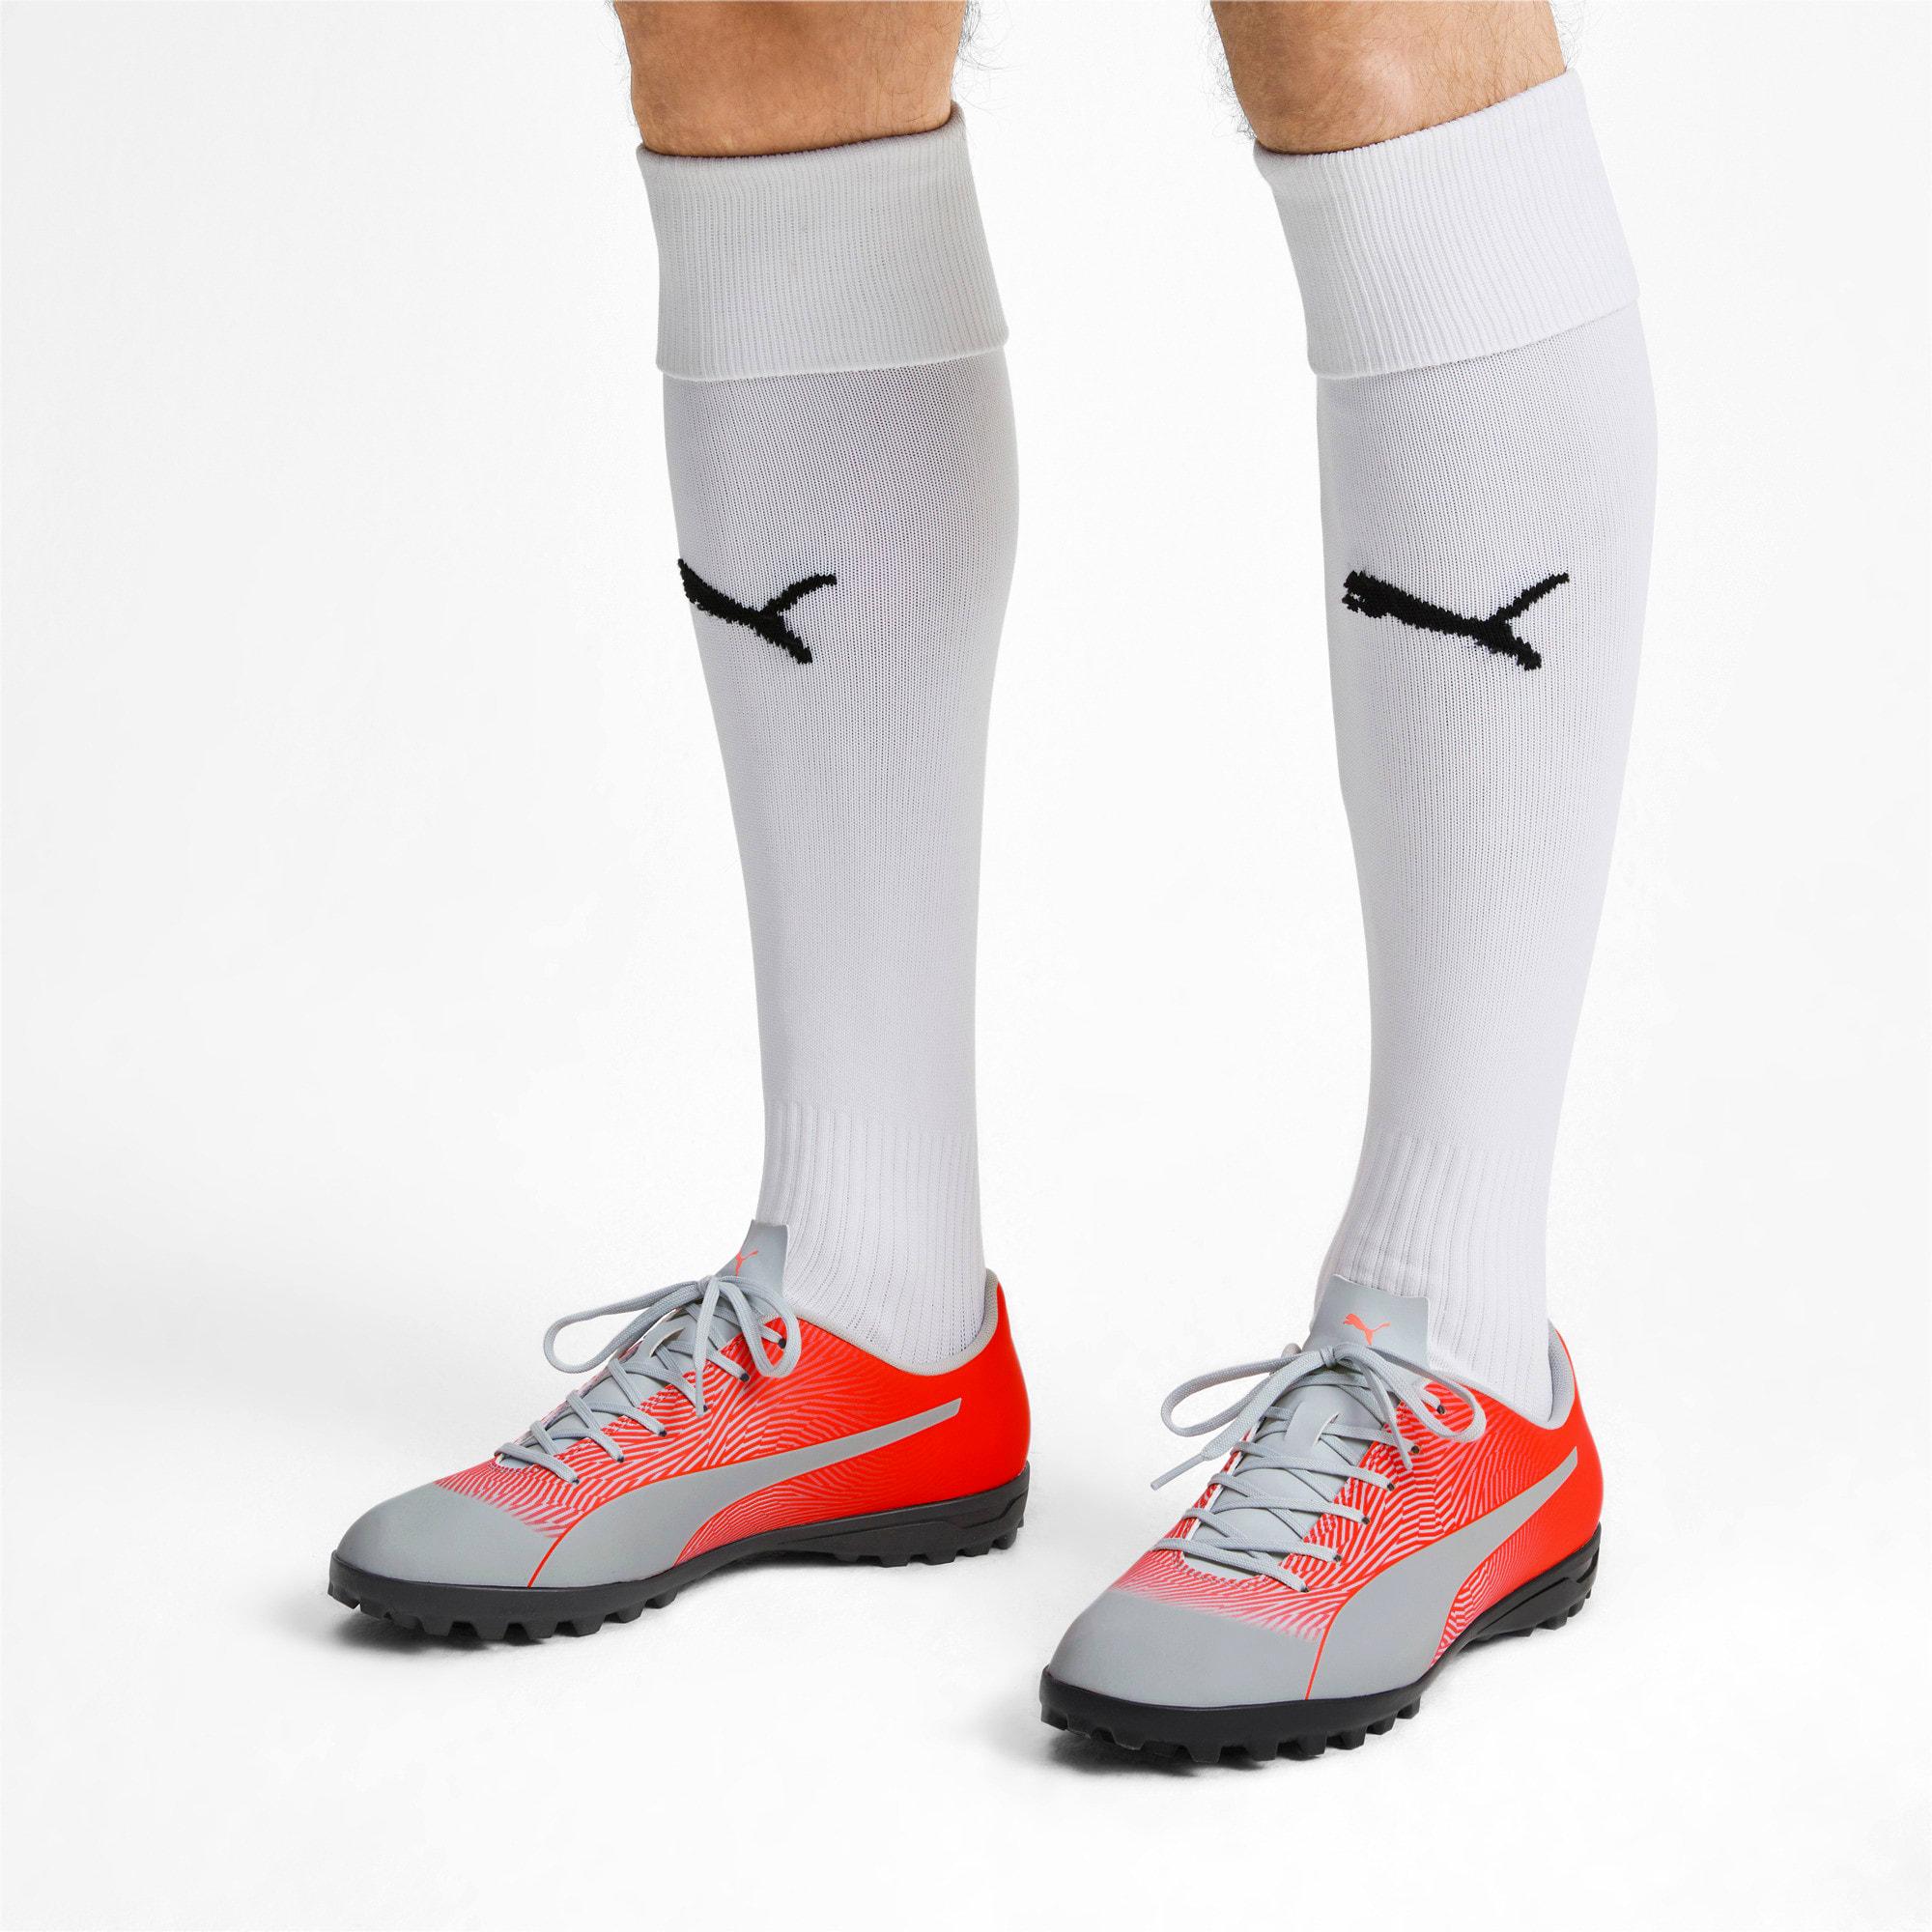 Thumbnail 3 of PUMA Spirit II TT Men's Soccer Shoes, Glacial Blue-Nrgy Red, medium